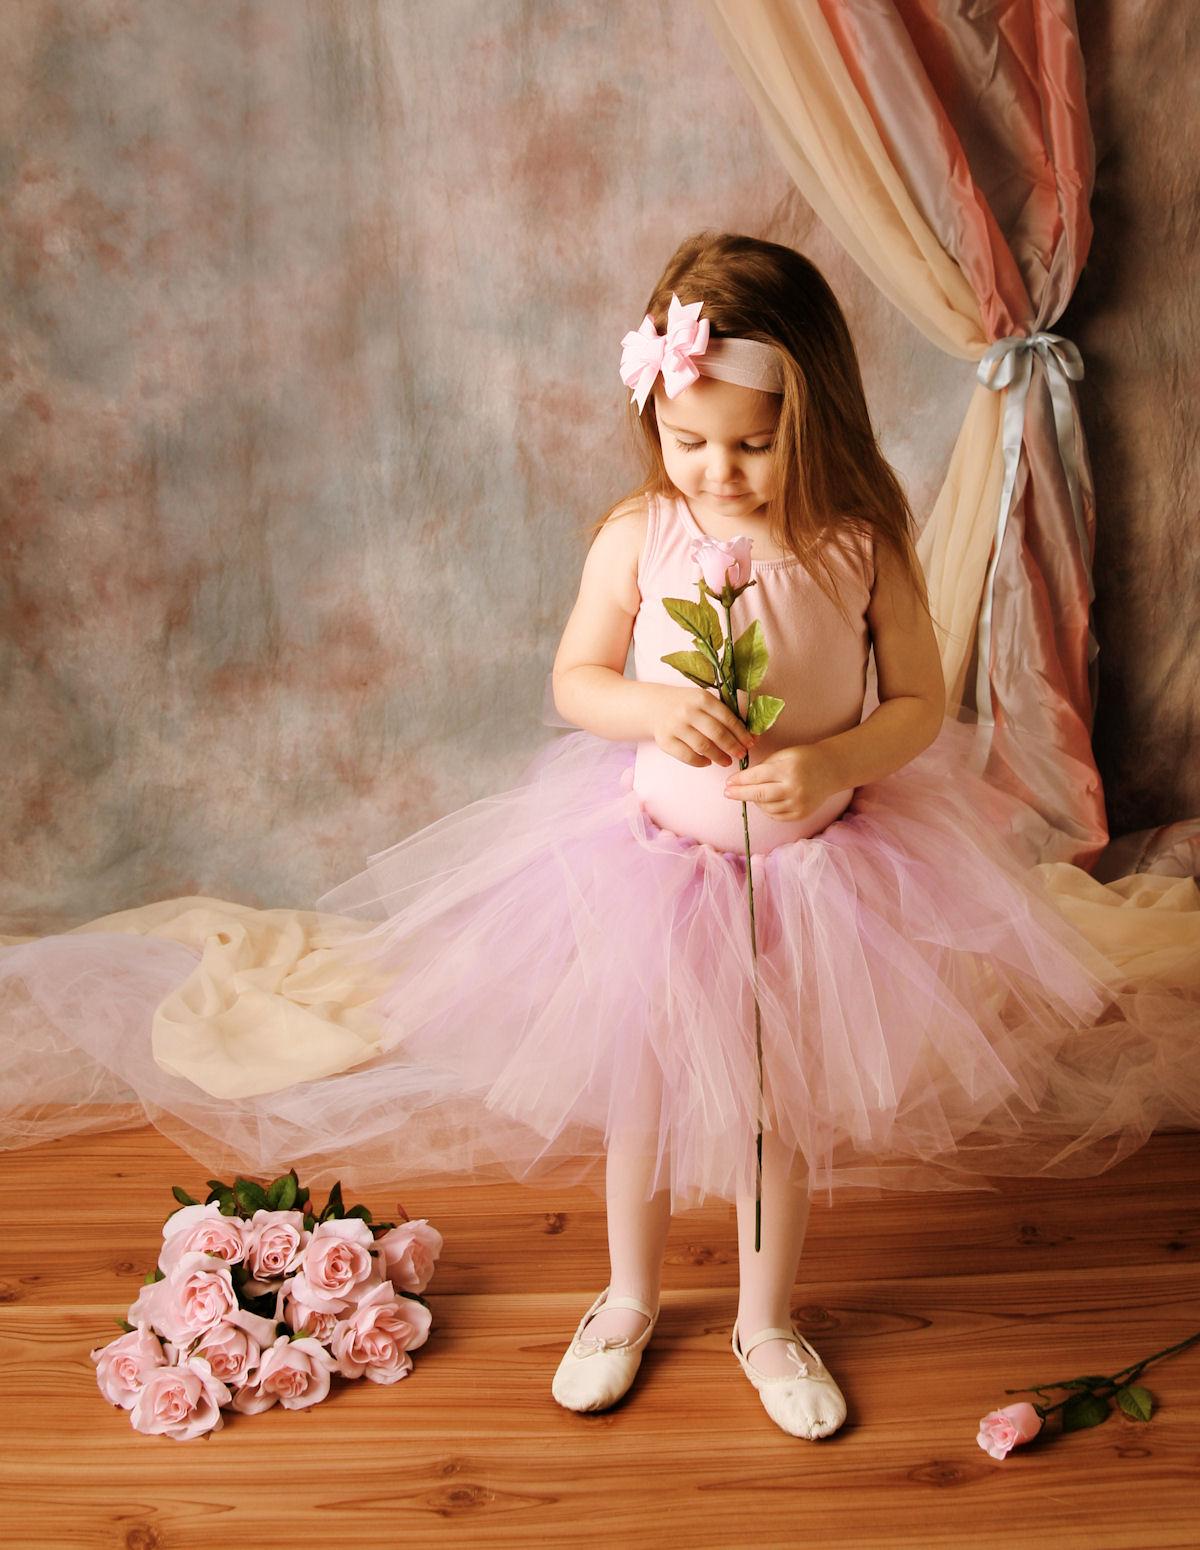 Самому букет, балерина с букетом фото